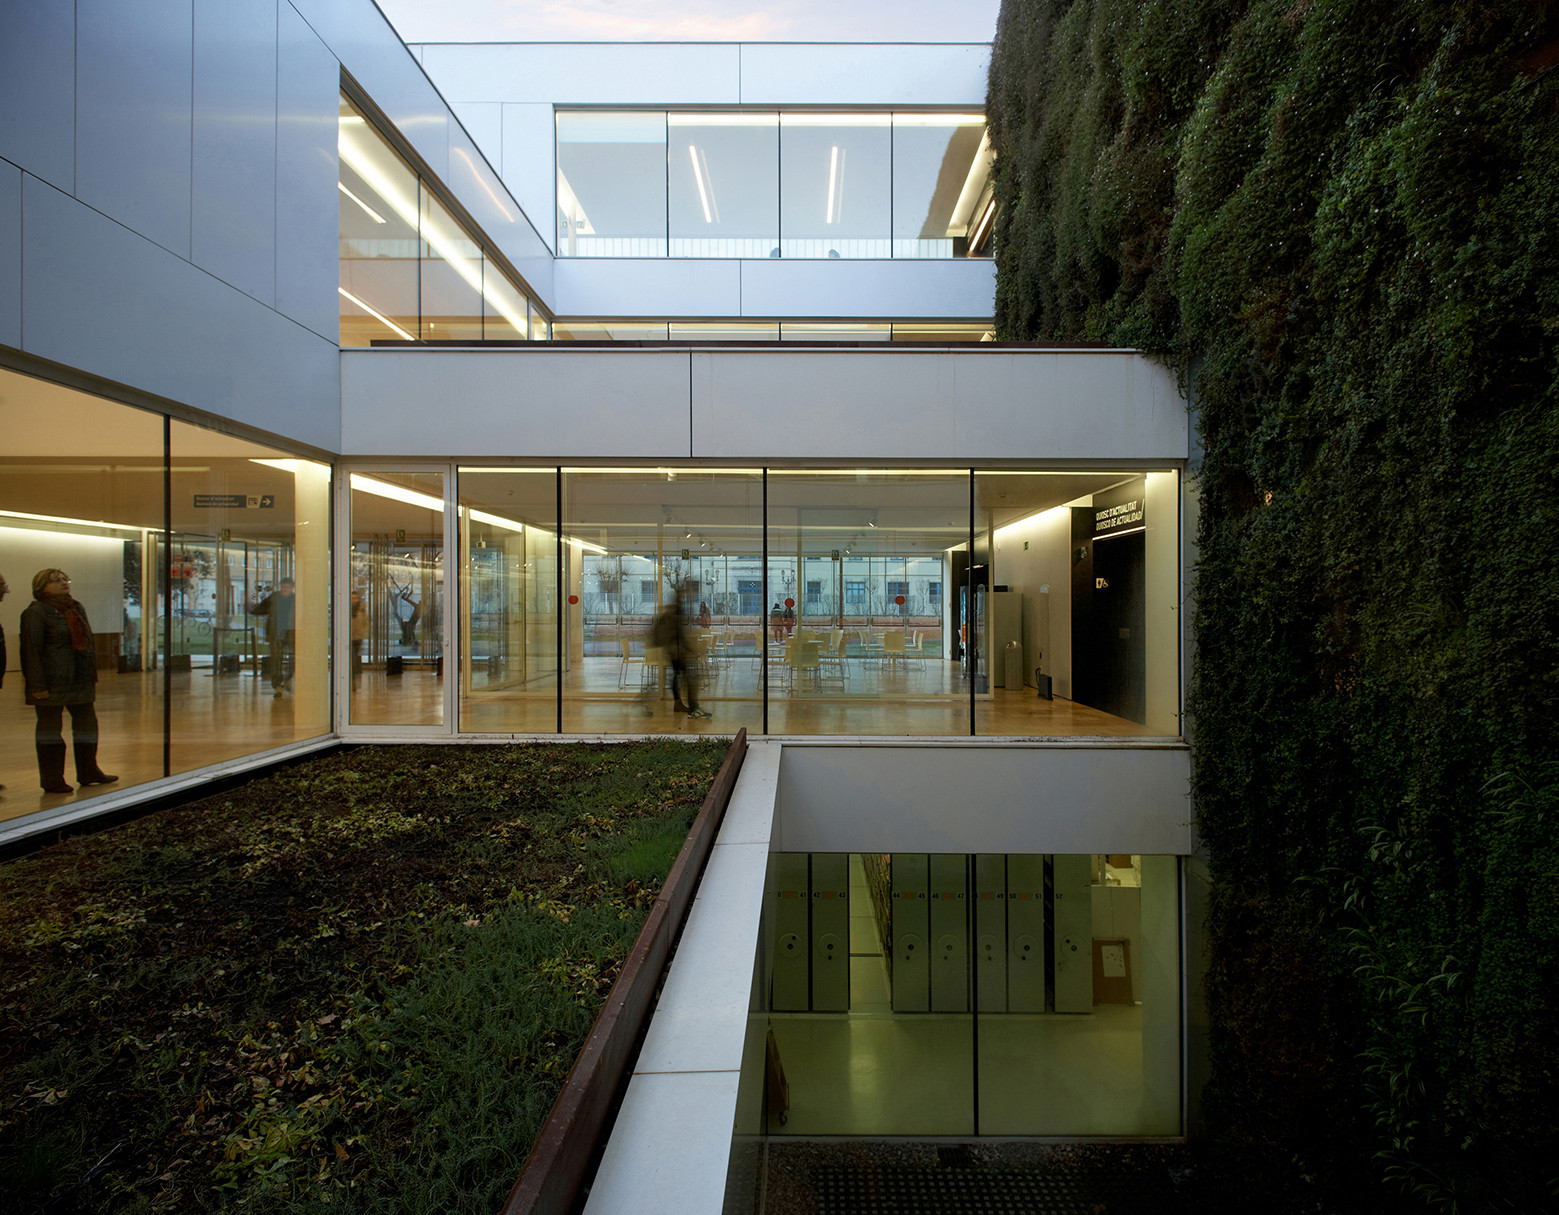 Biblioteca Pública en Girona / Corea & Moran Arquitectura, © Pepo Segura